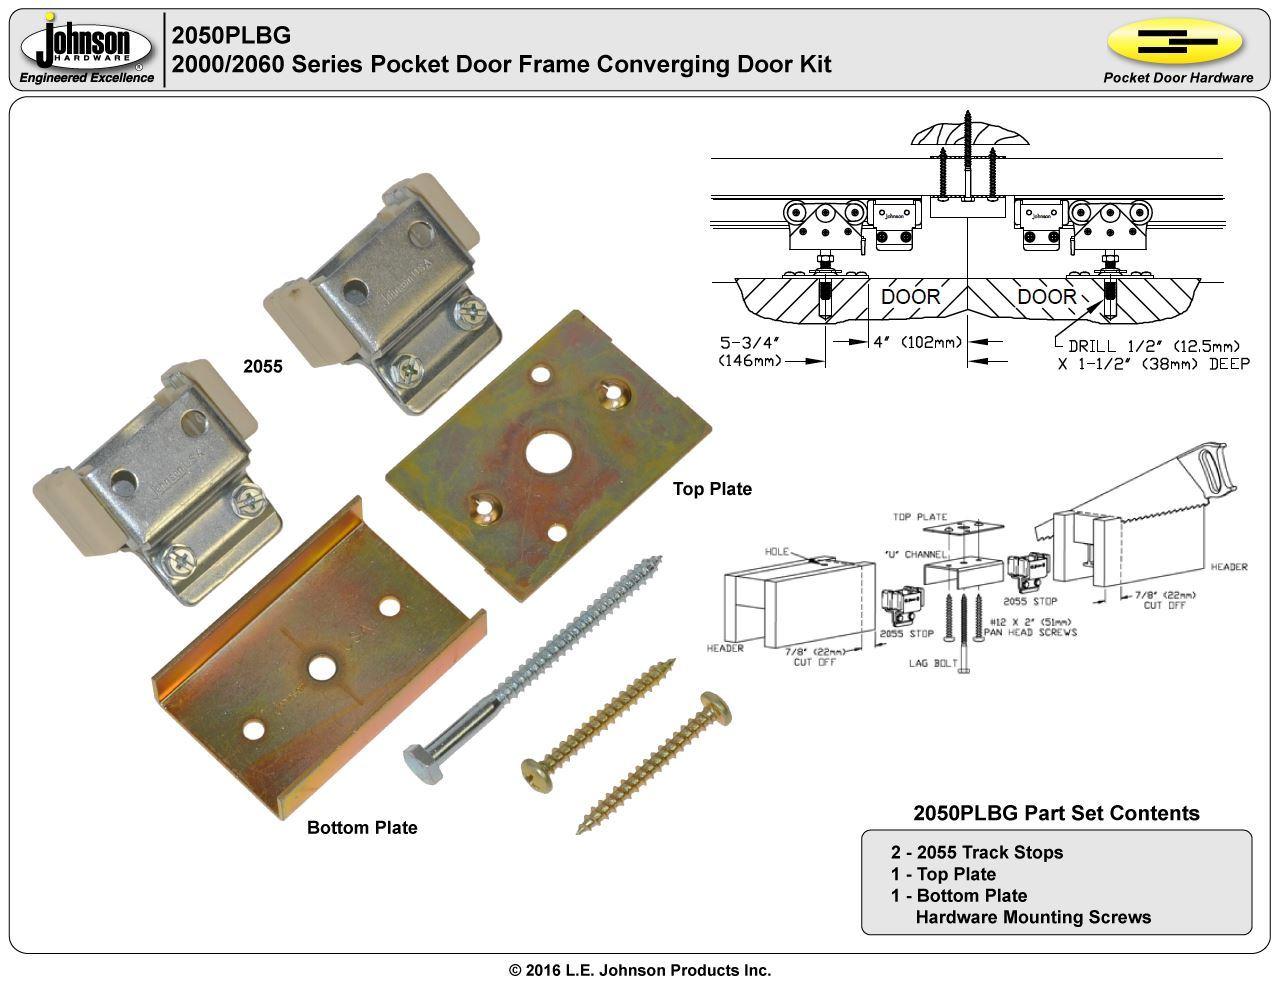 Hardware For Double Converging Pocket Doors : Plbg converging door kit johnsonhardware